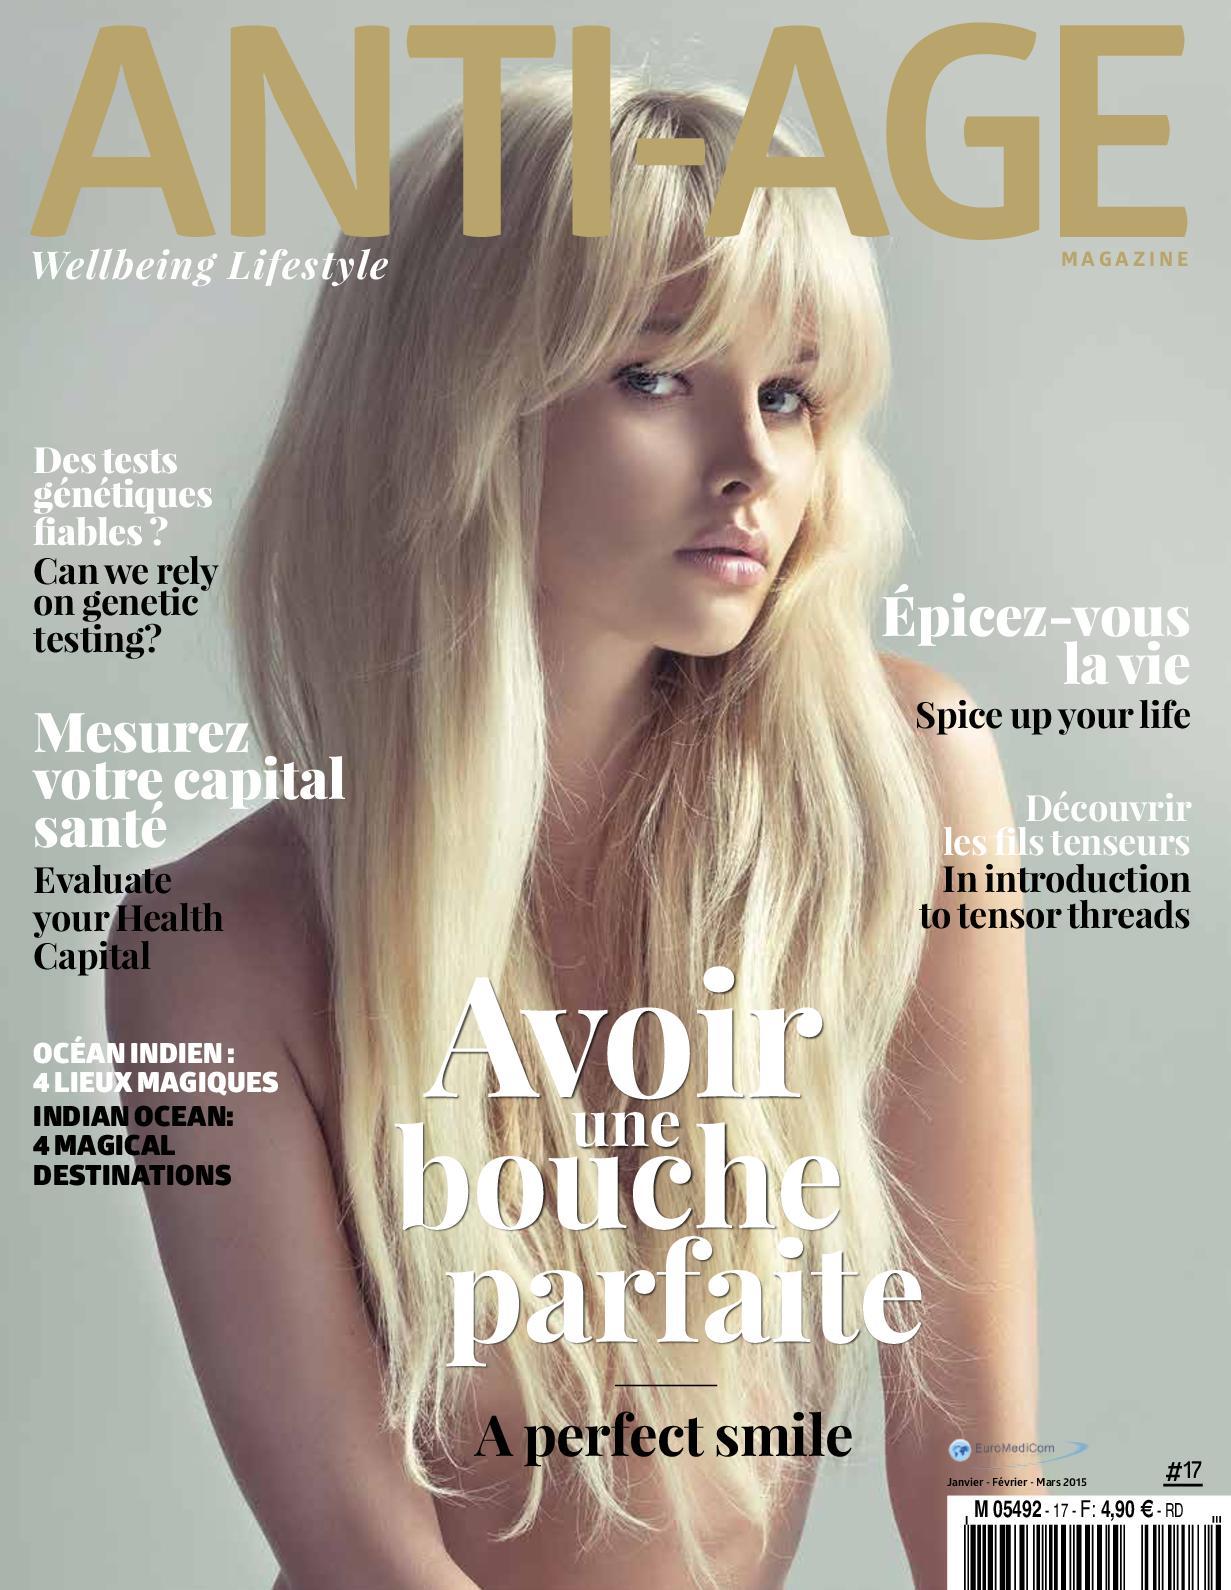 ANTI-AGE Magazine #17